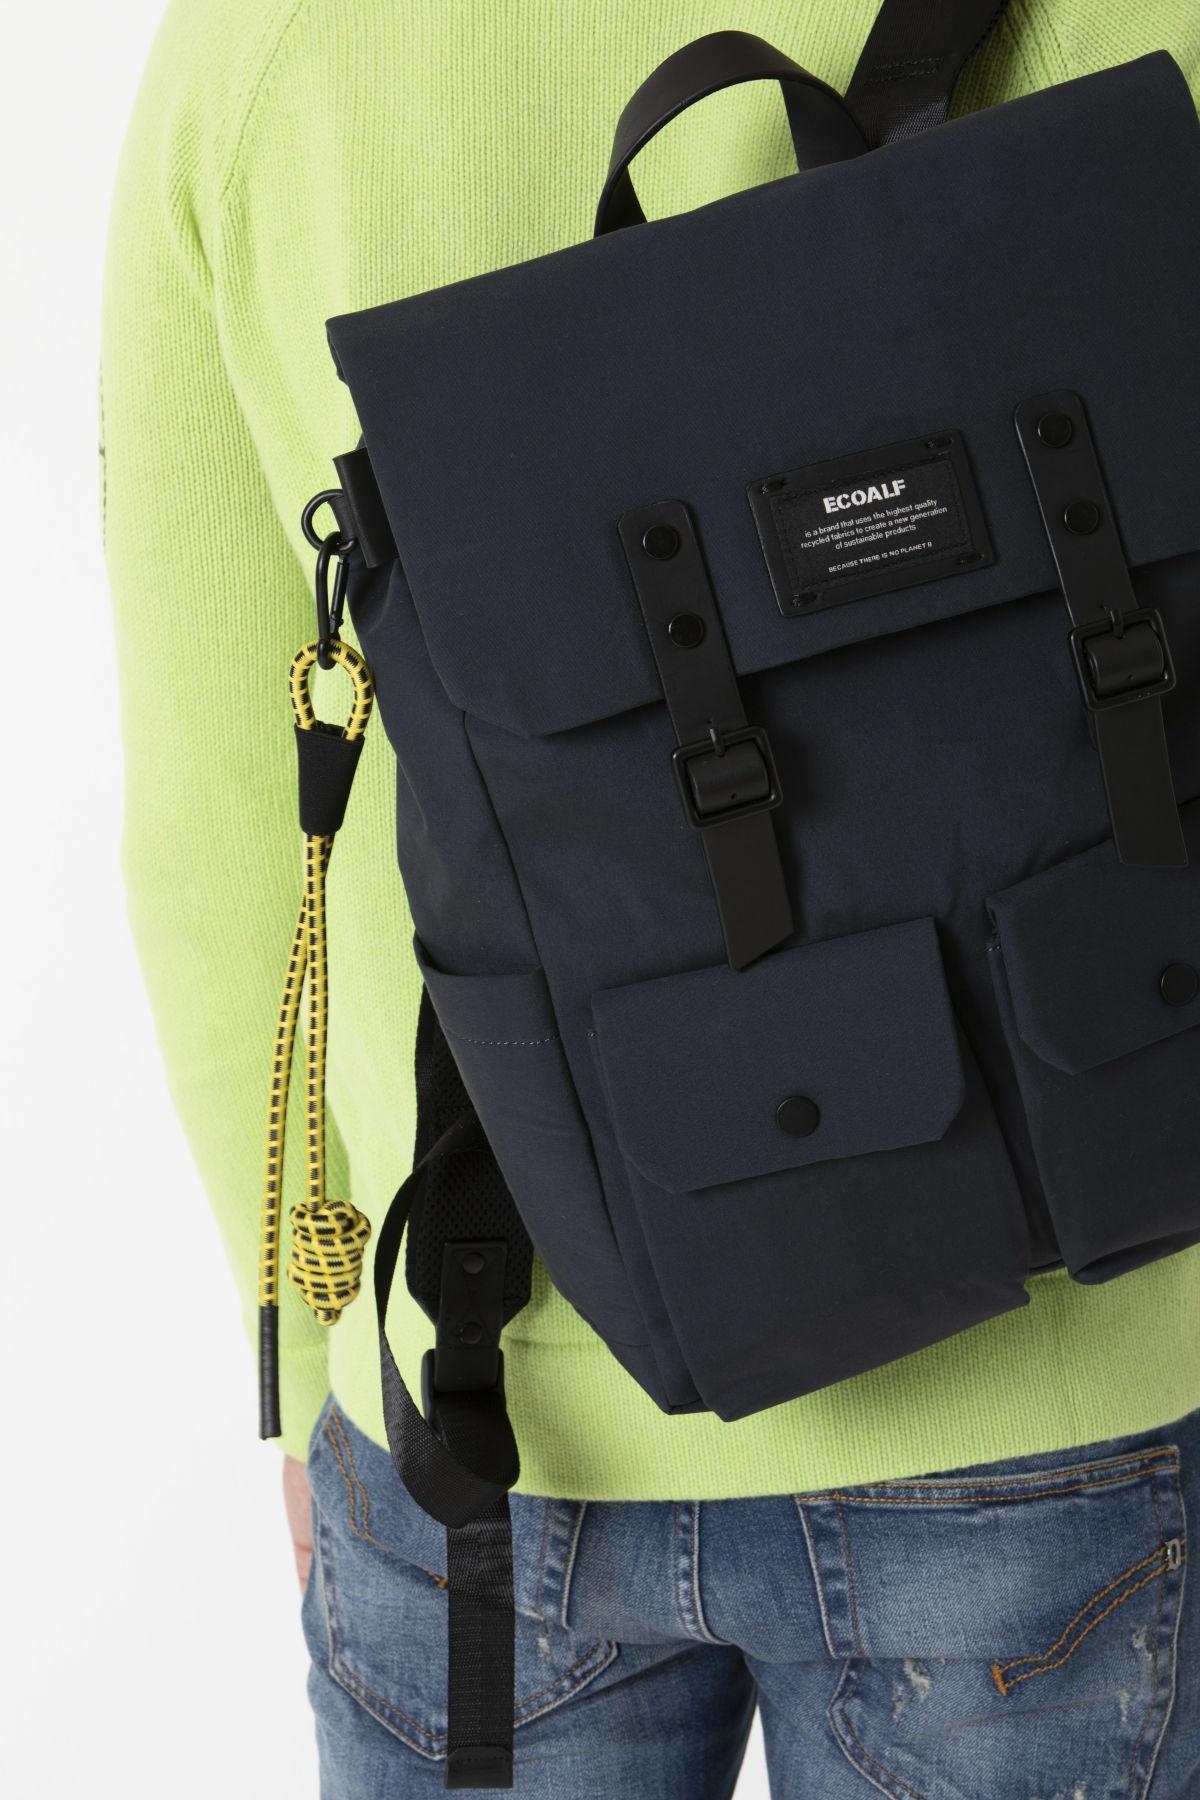 ZERMAT Backpack ECOALF F/W 19-20